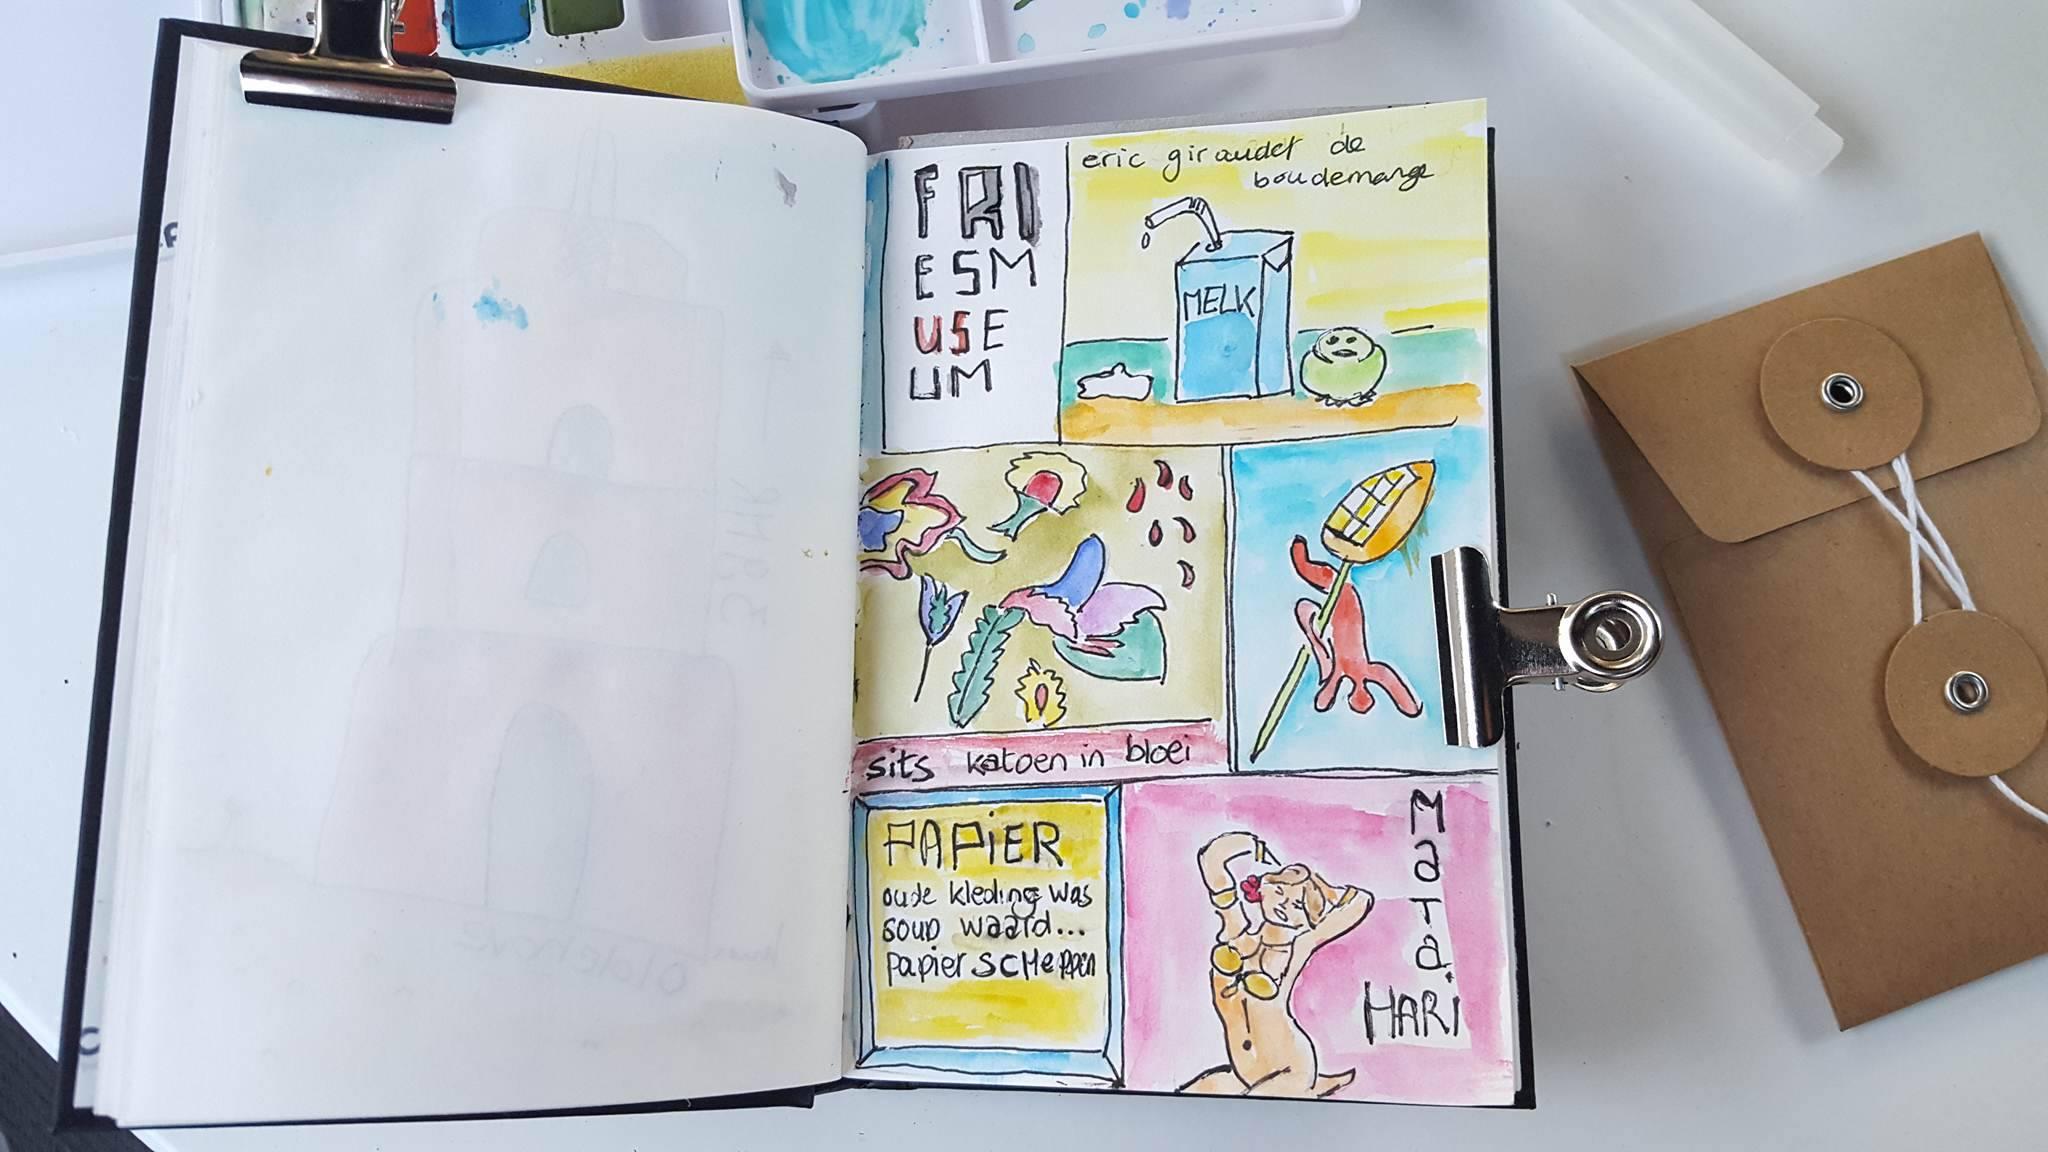 Liflotte dagboek Fries Museum 2017